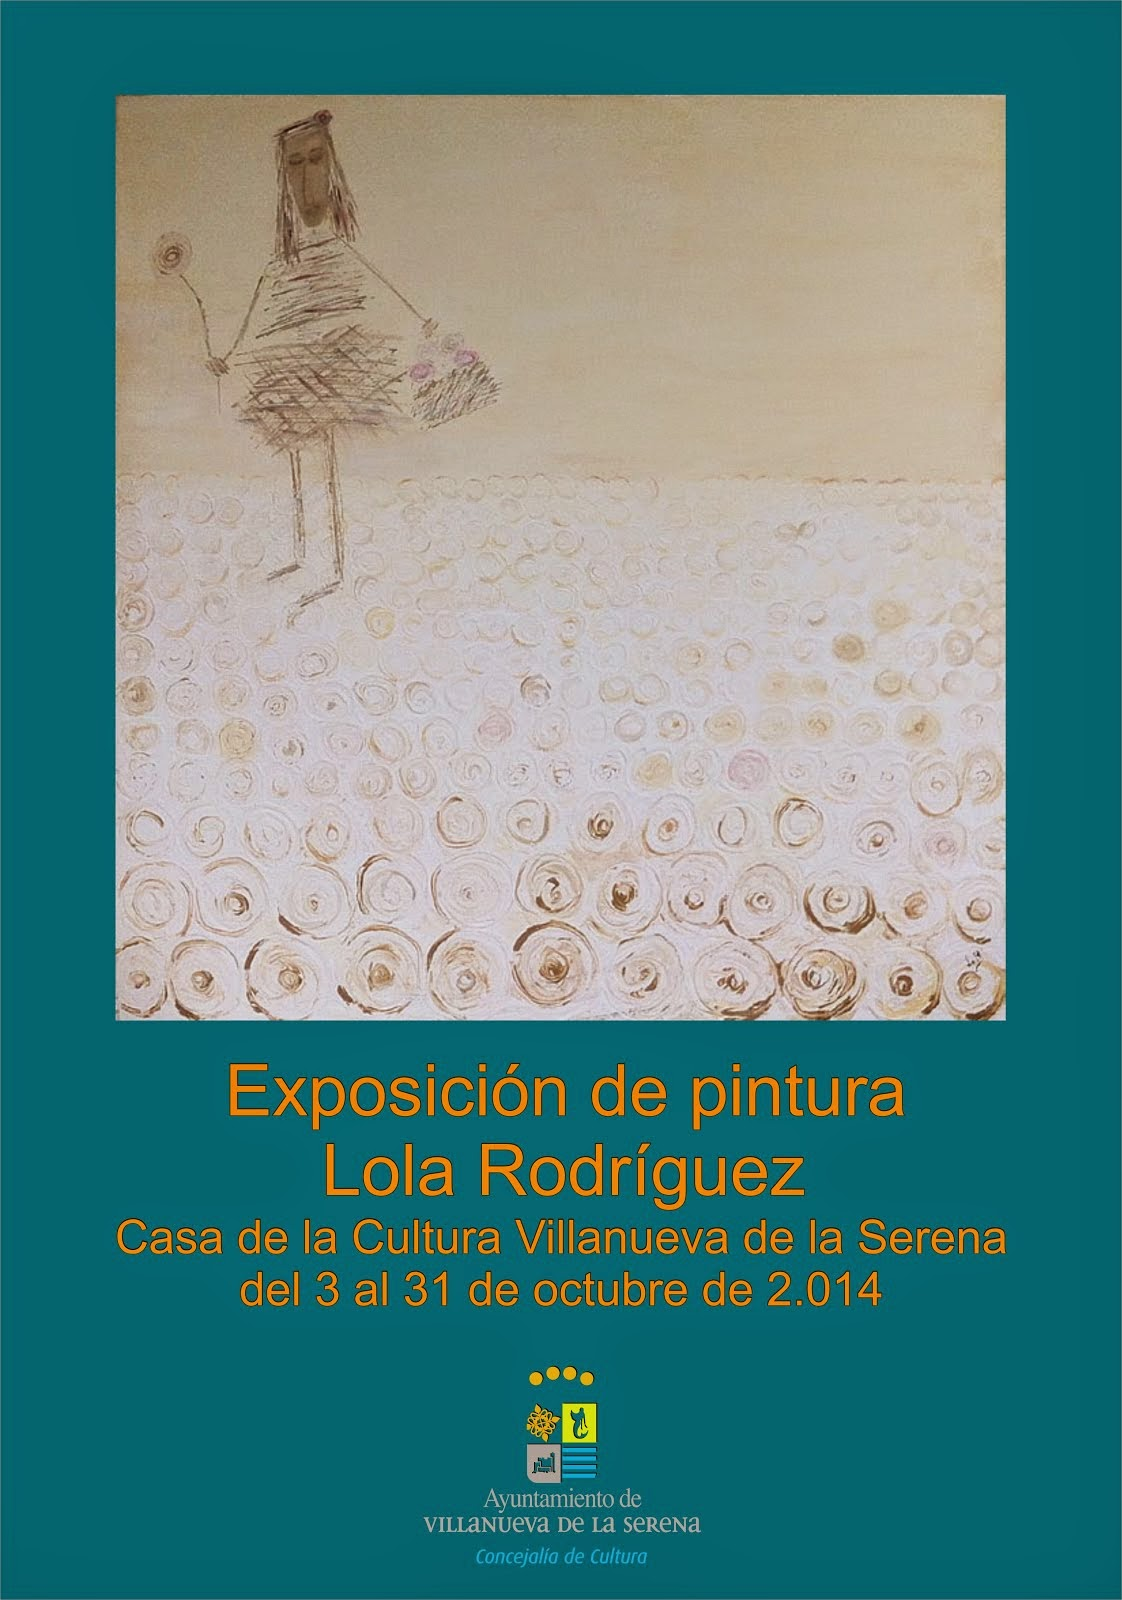 Exposición de pintura de Lola Rodríguez